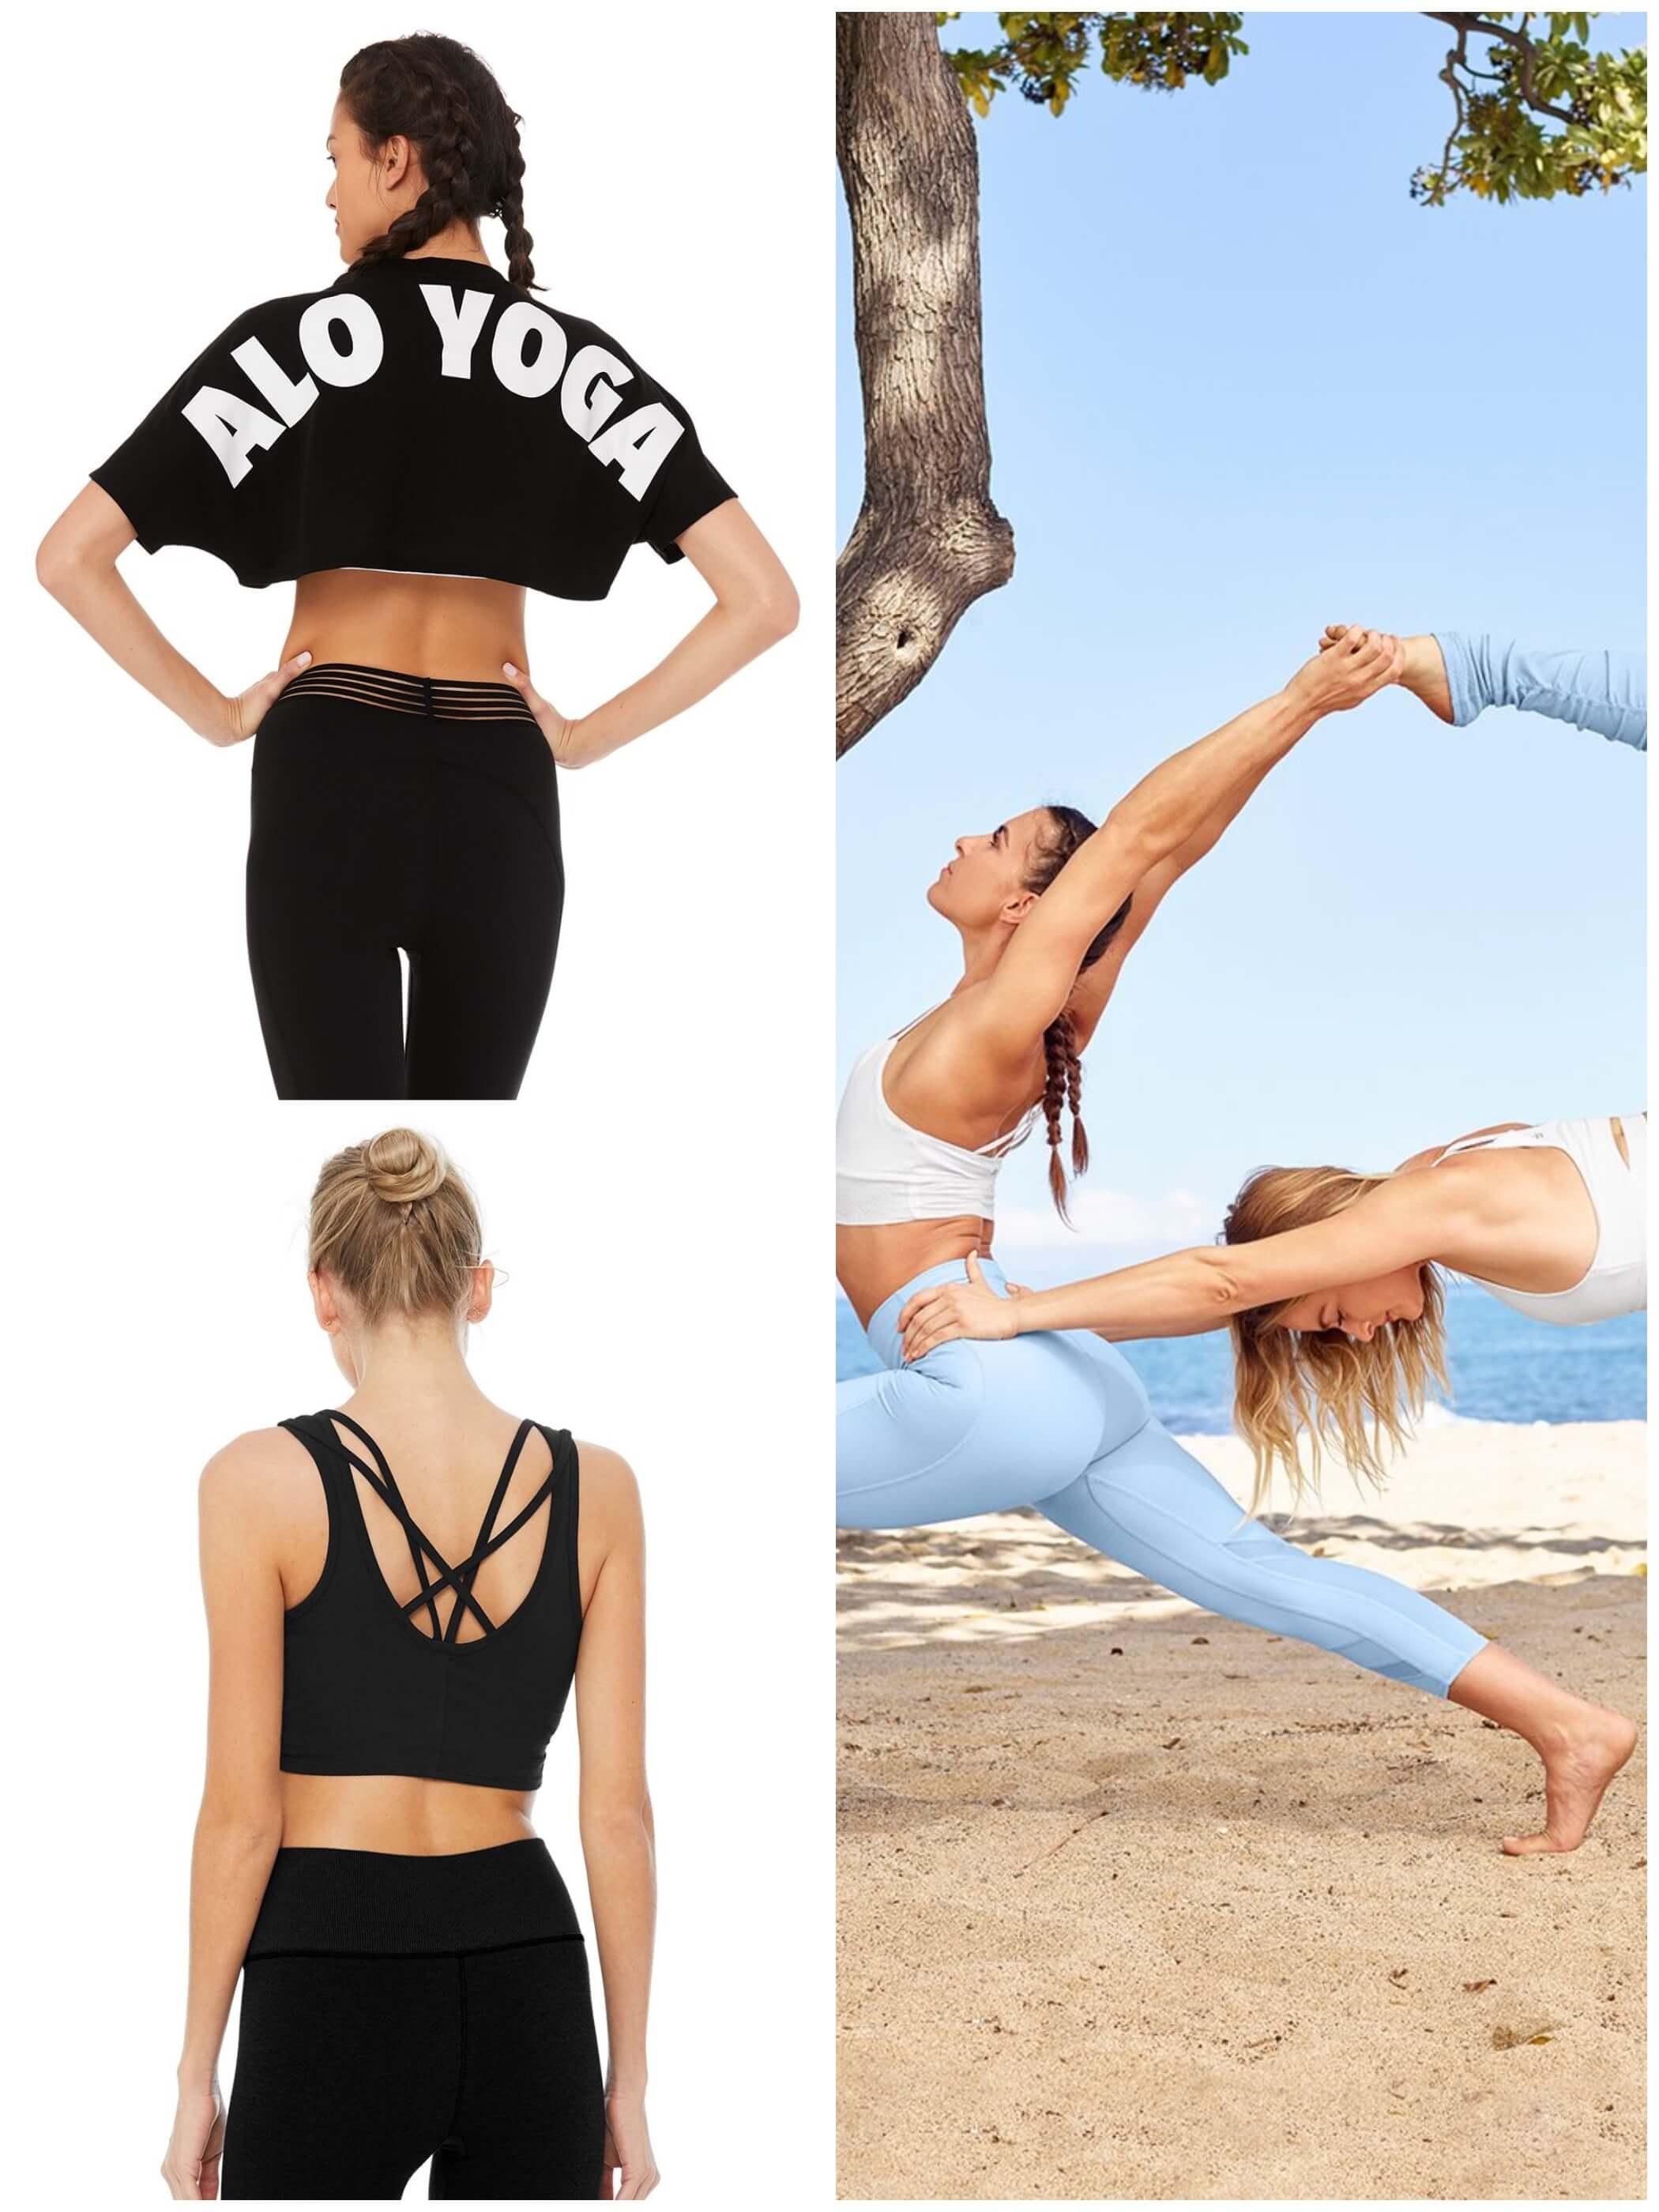 marque vetement yoga